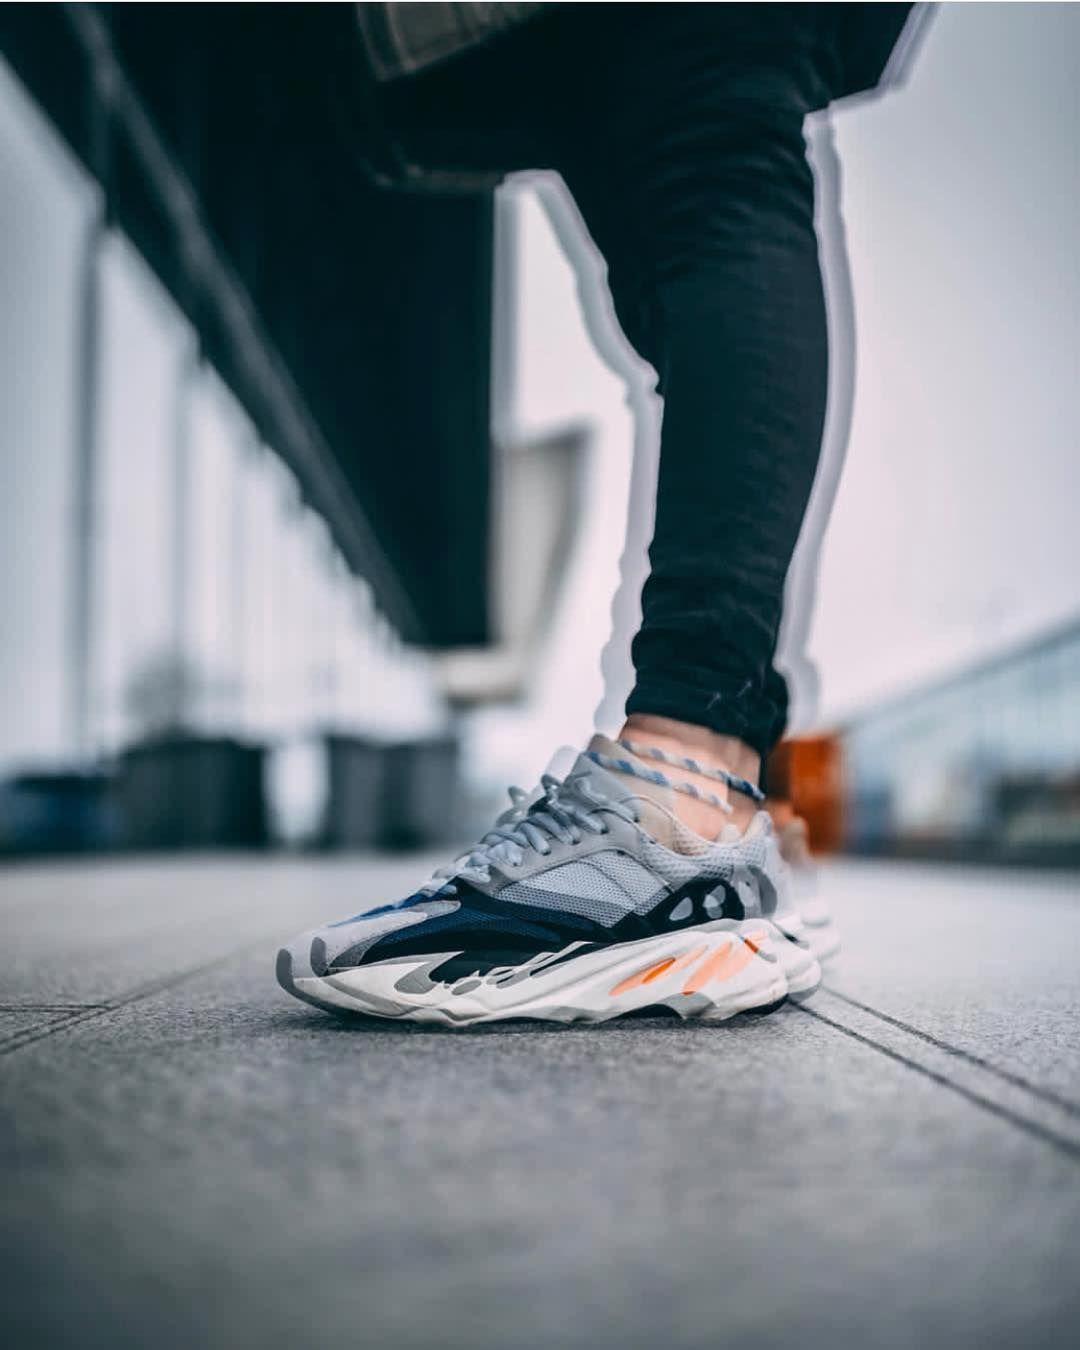 Adidas Yeezy Boost 700 Wave Runner By Peter Coyne Neue Sneaker Sneaker Schuhe